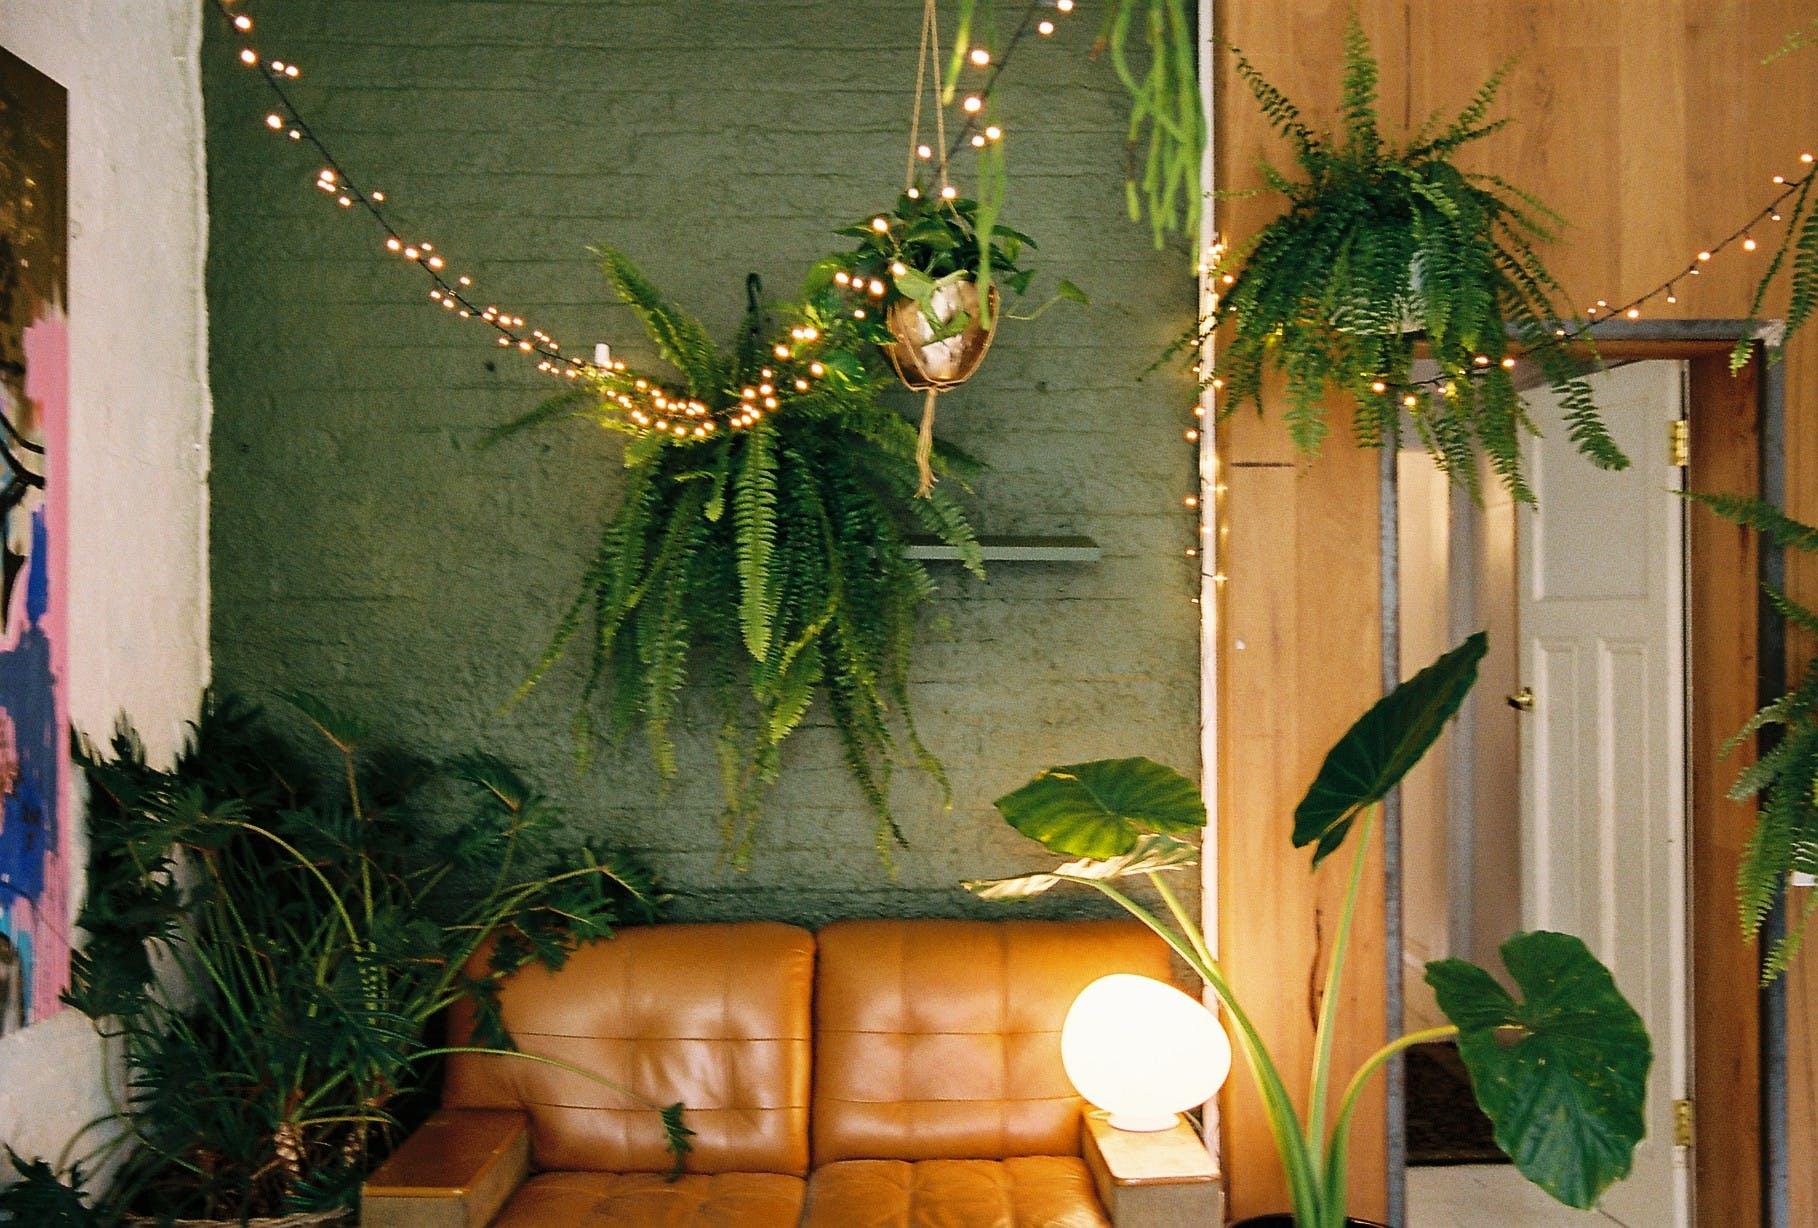 Collingwood Plant Studio, multi-use area at Jenna Holmes, image 3